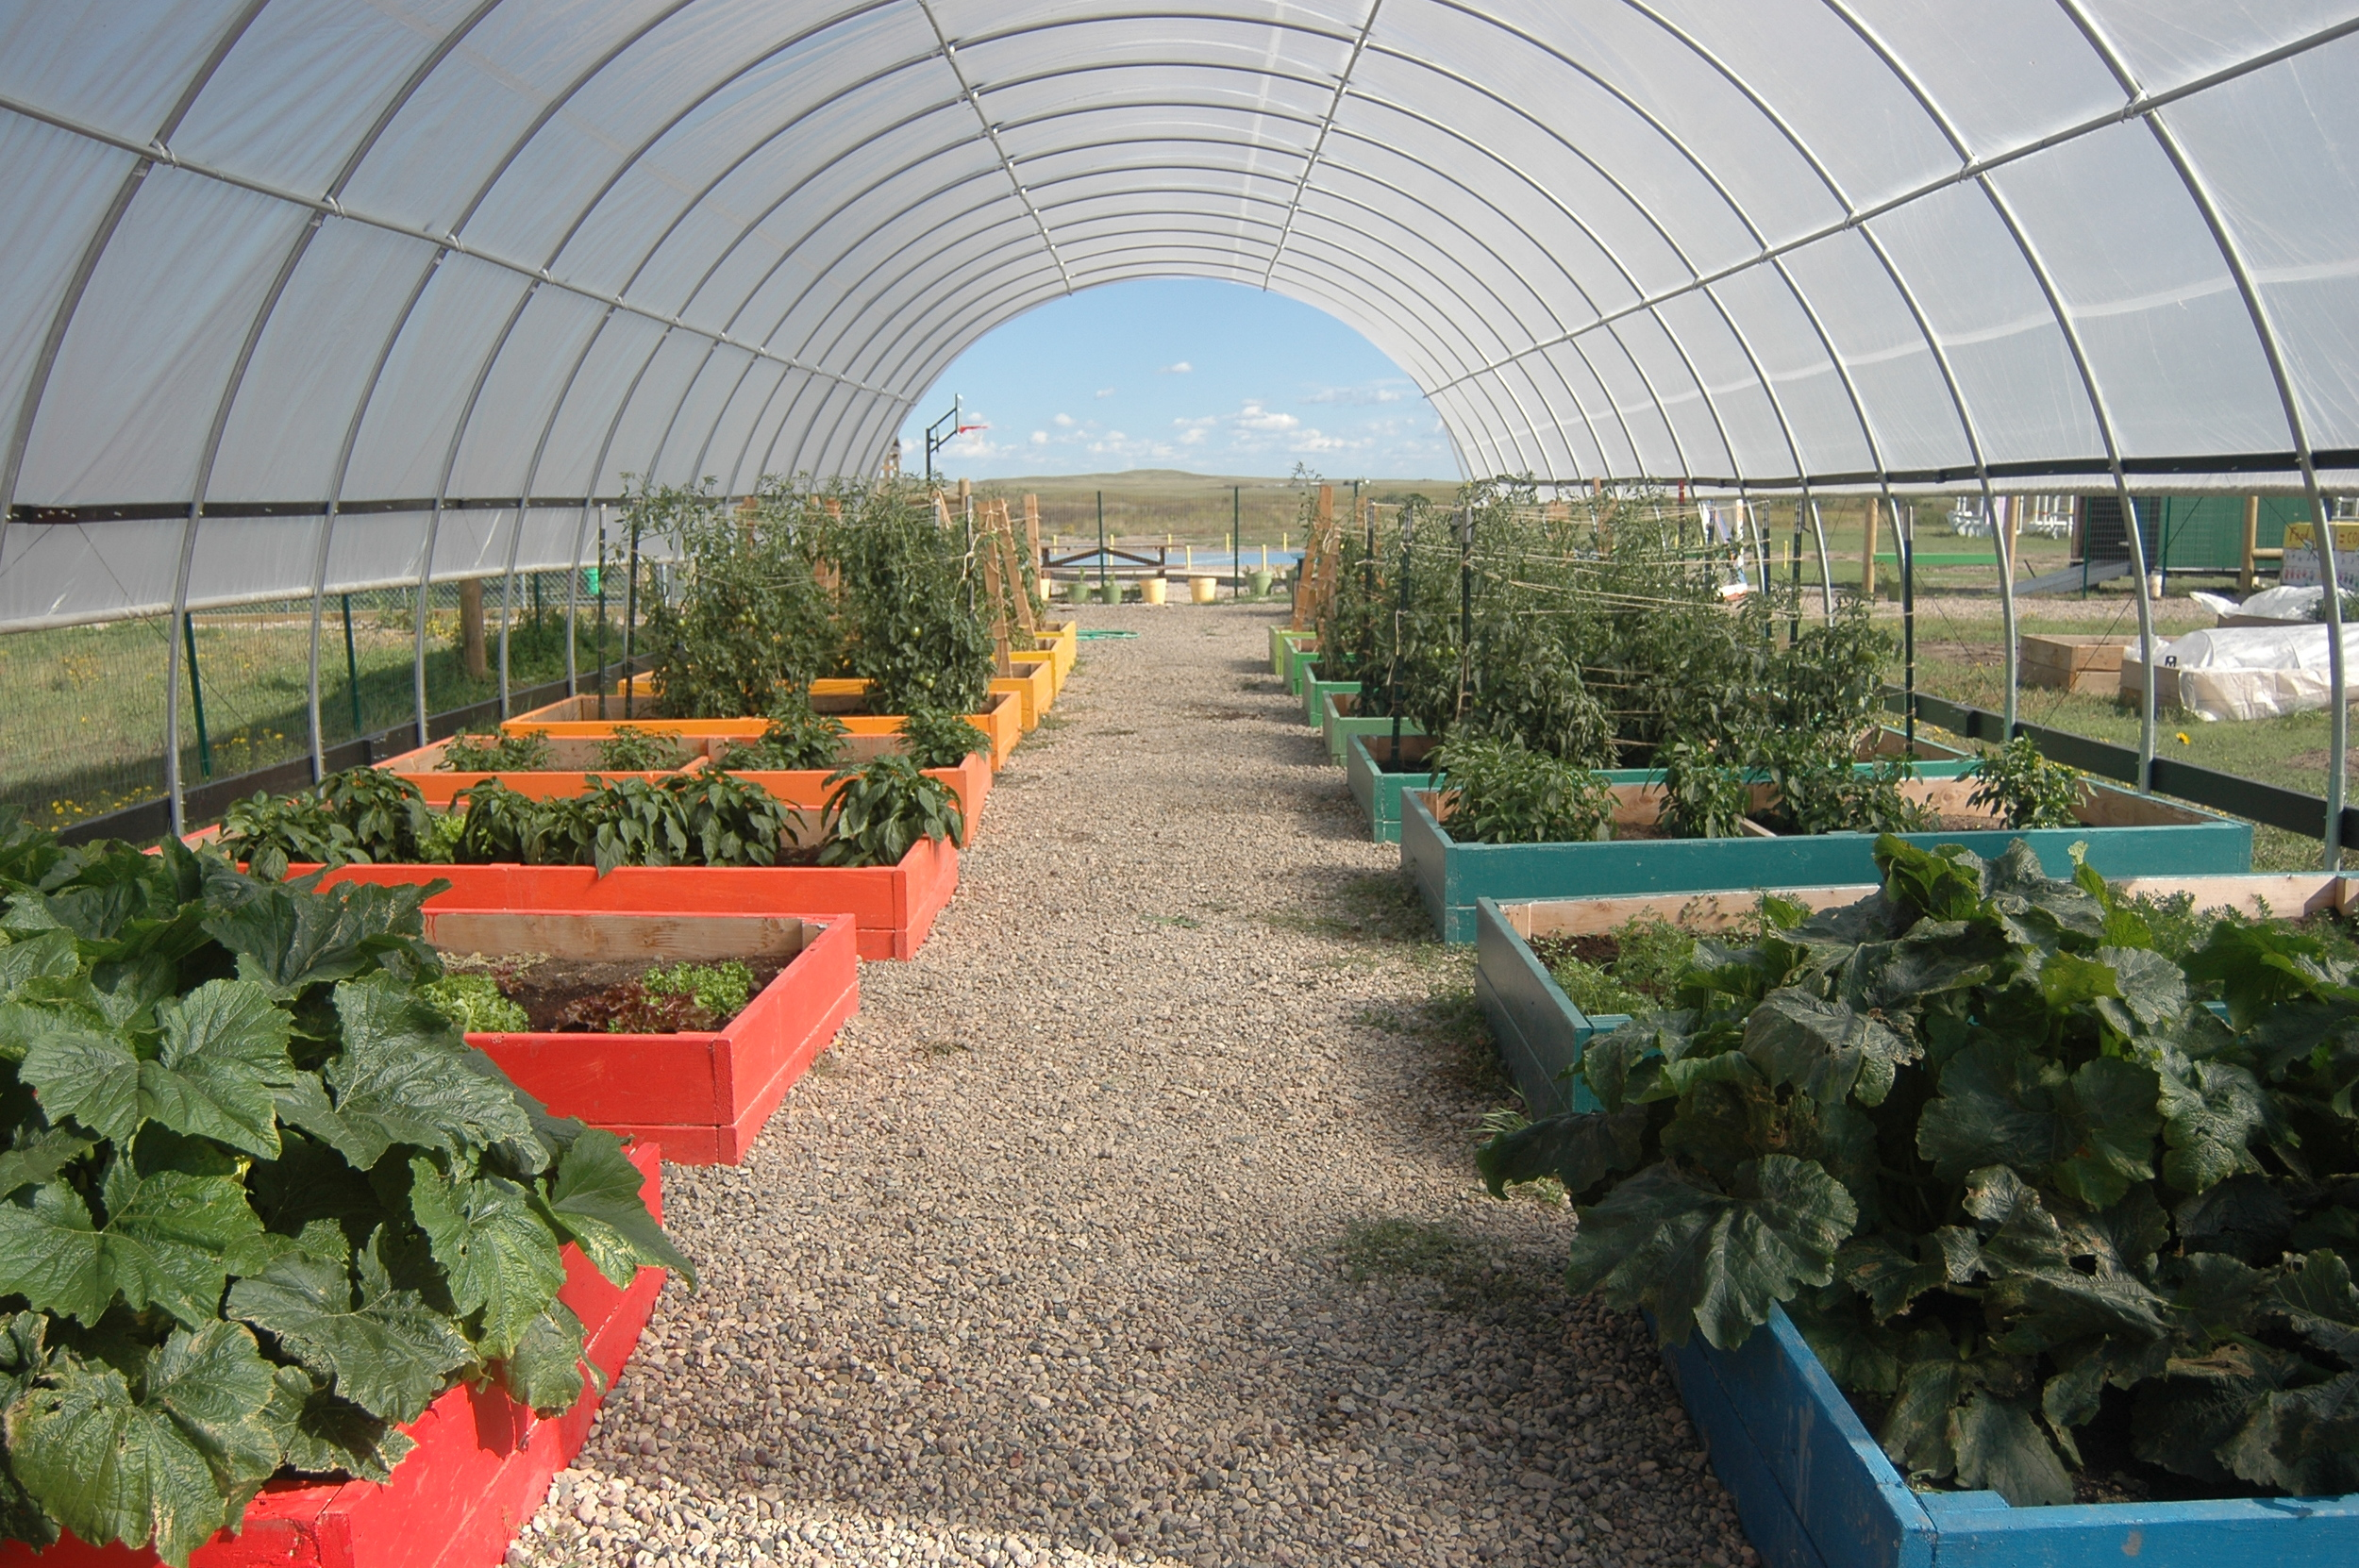 The community micro-farm